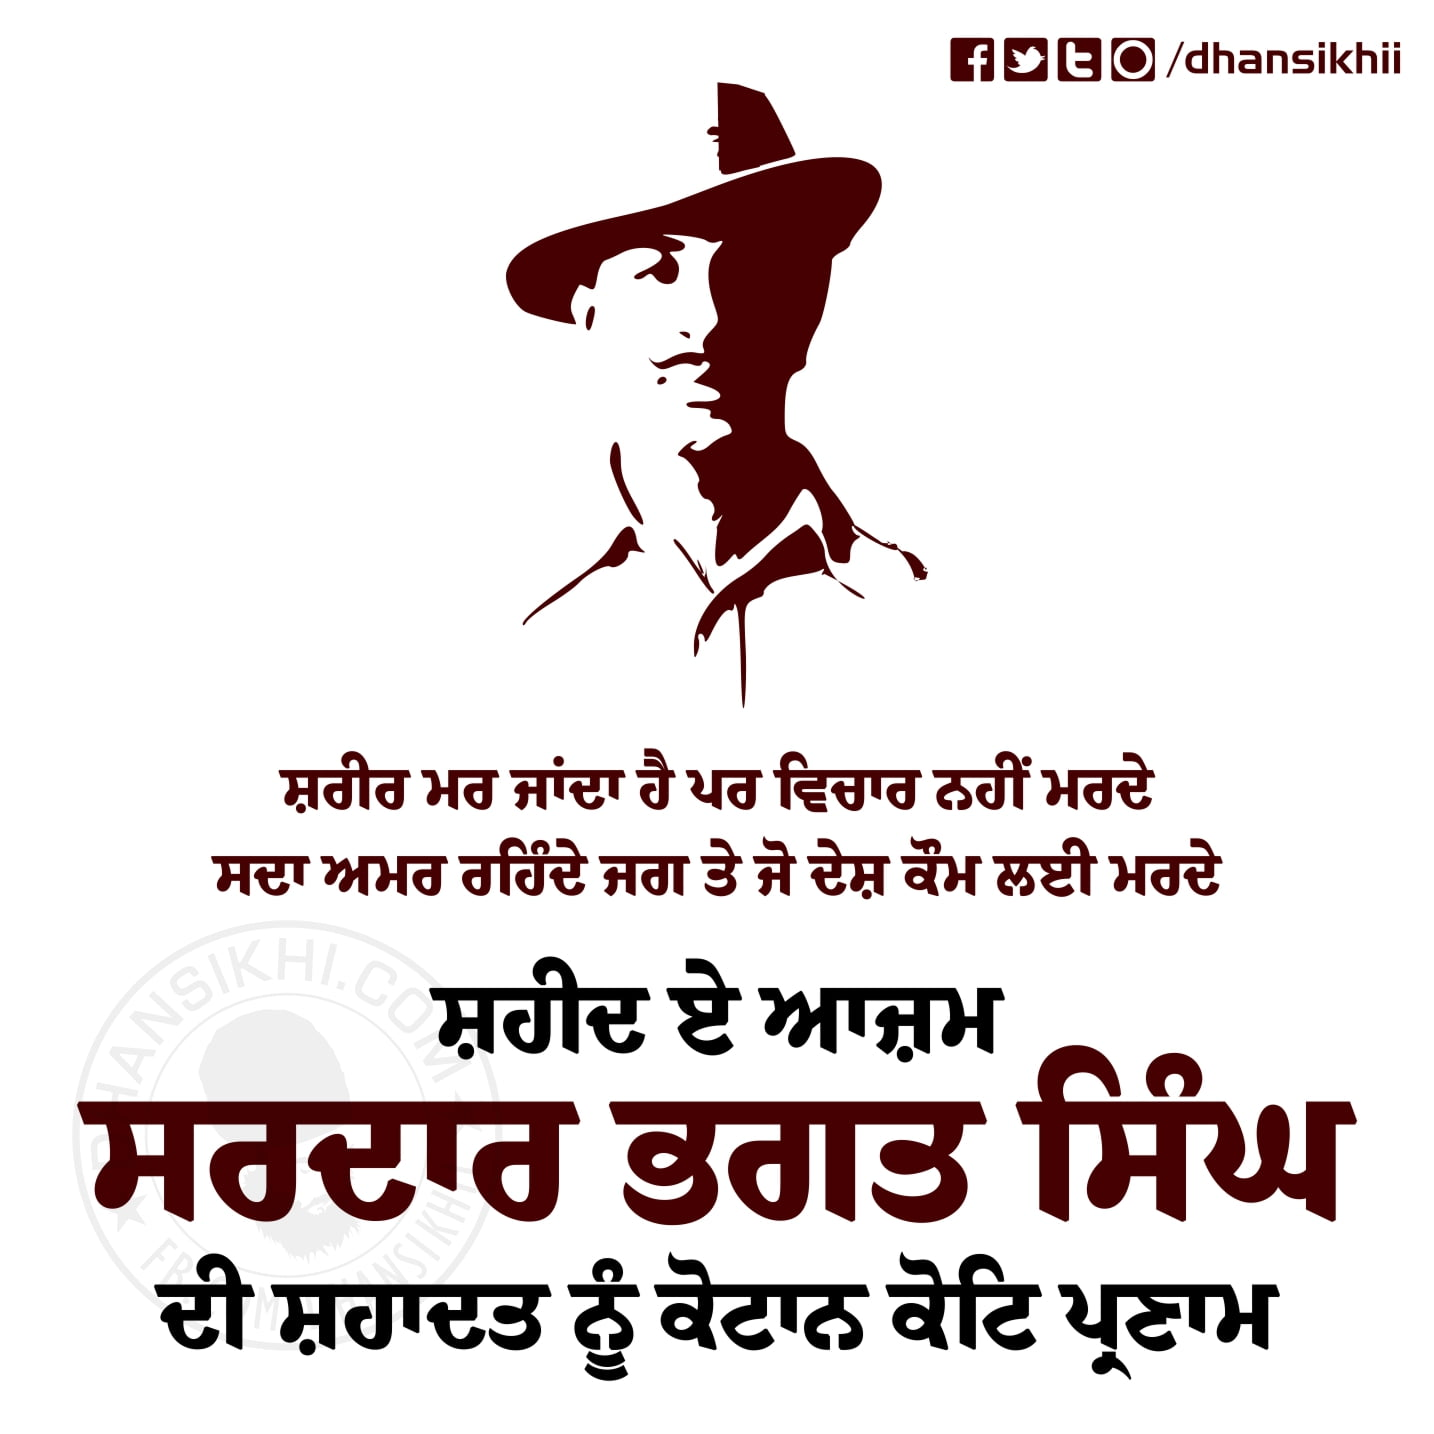 Bhagat Singh Shahidi Greeting for Insta and Whatsapp